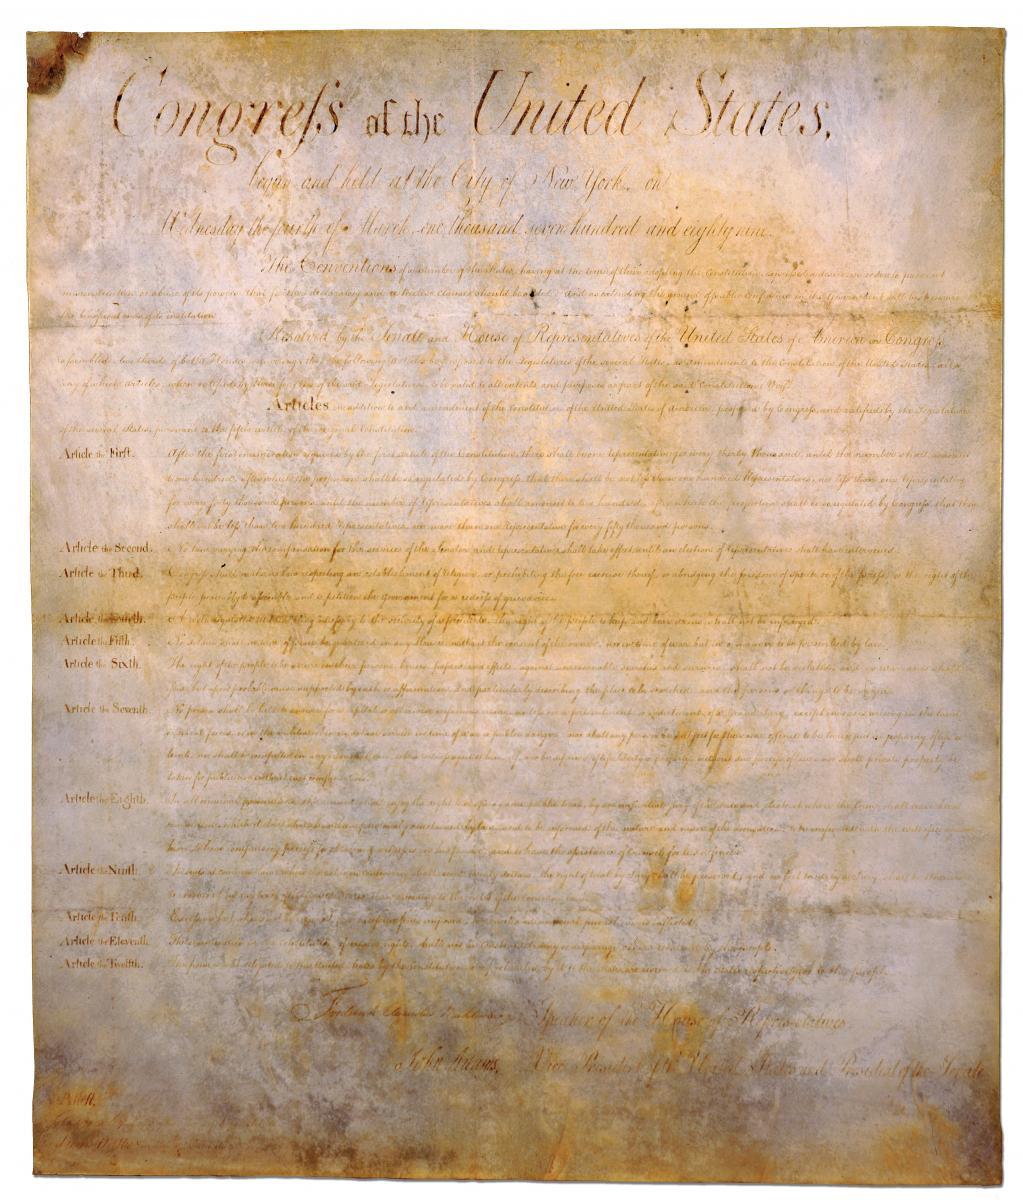 (Closed) North Carolina's Original Bill Of Rights